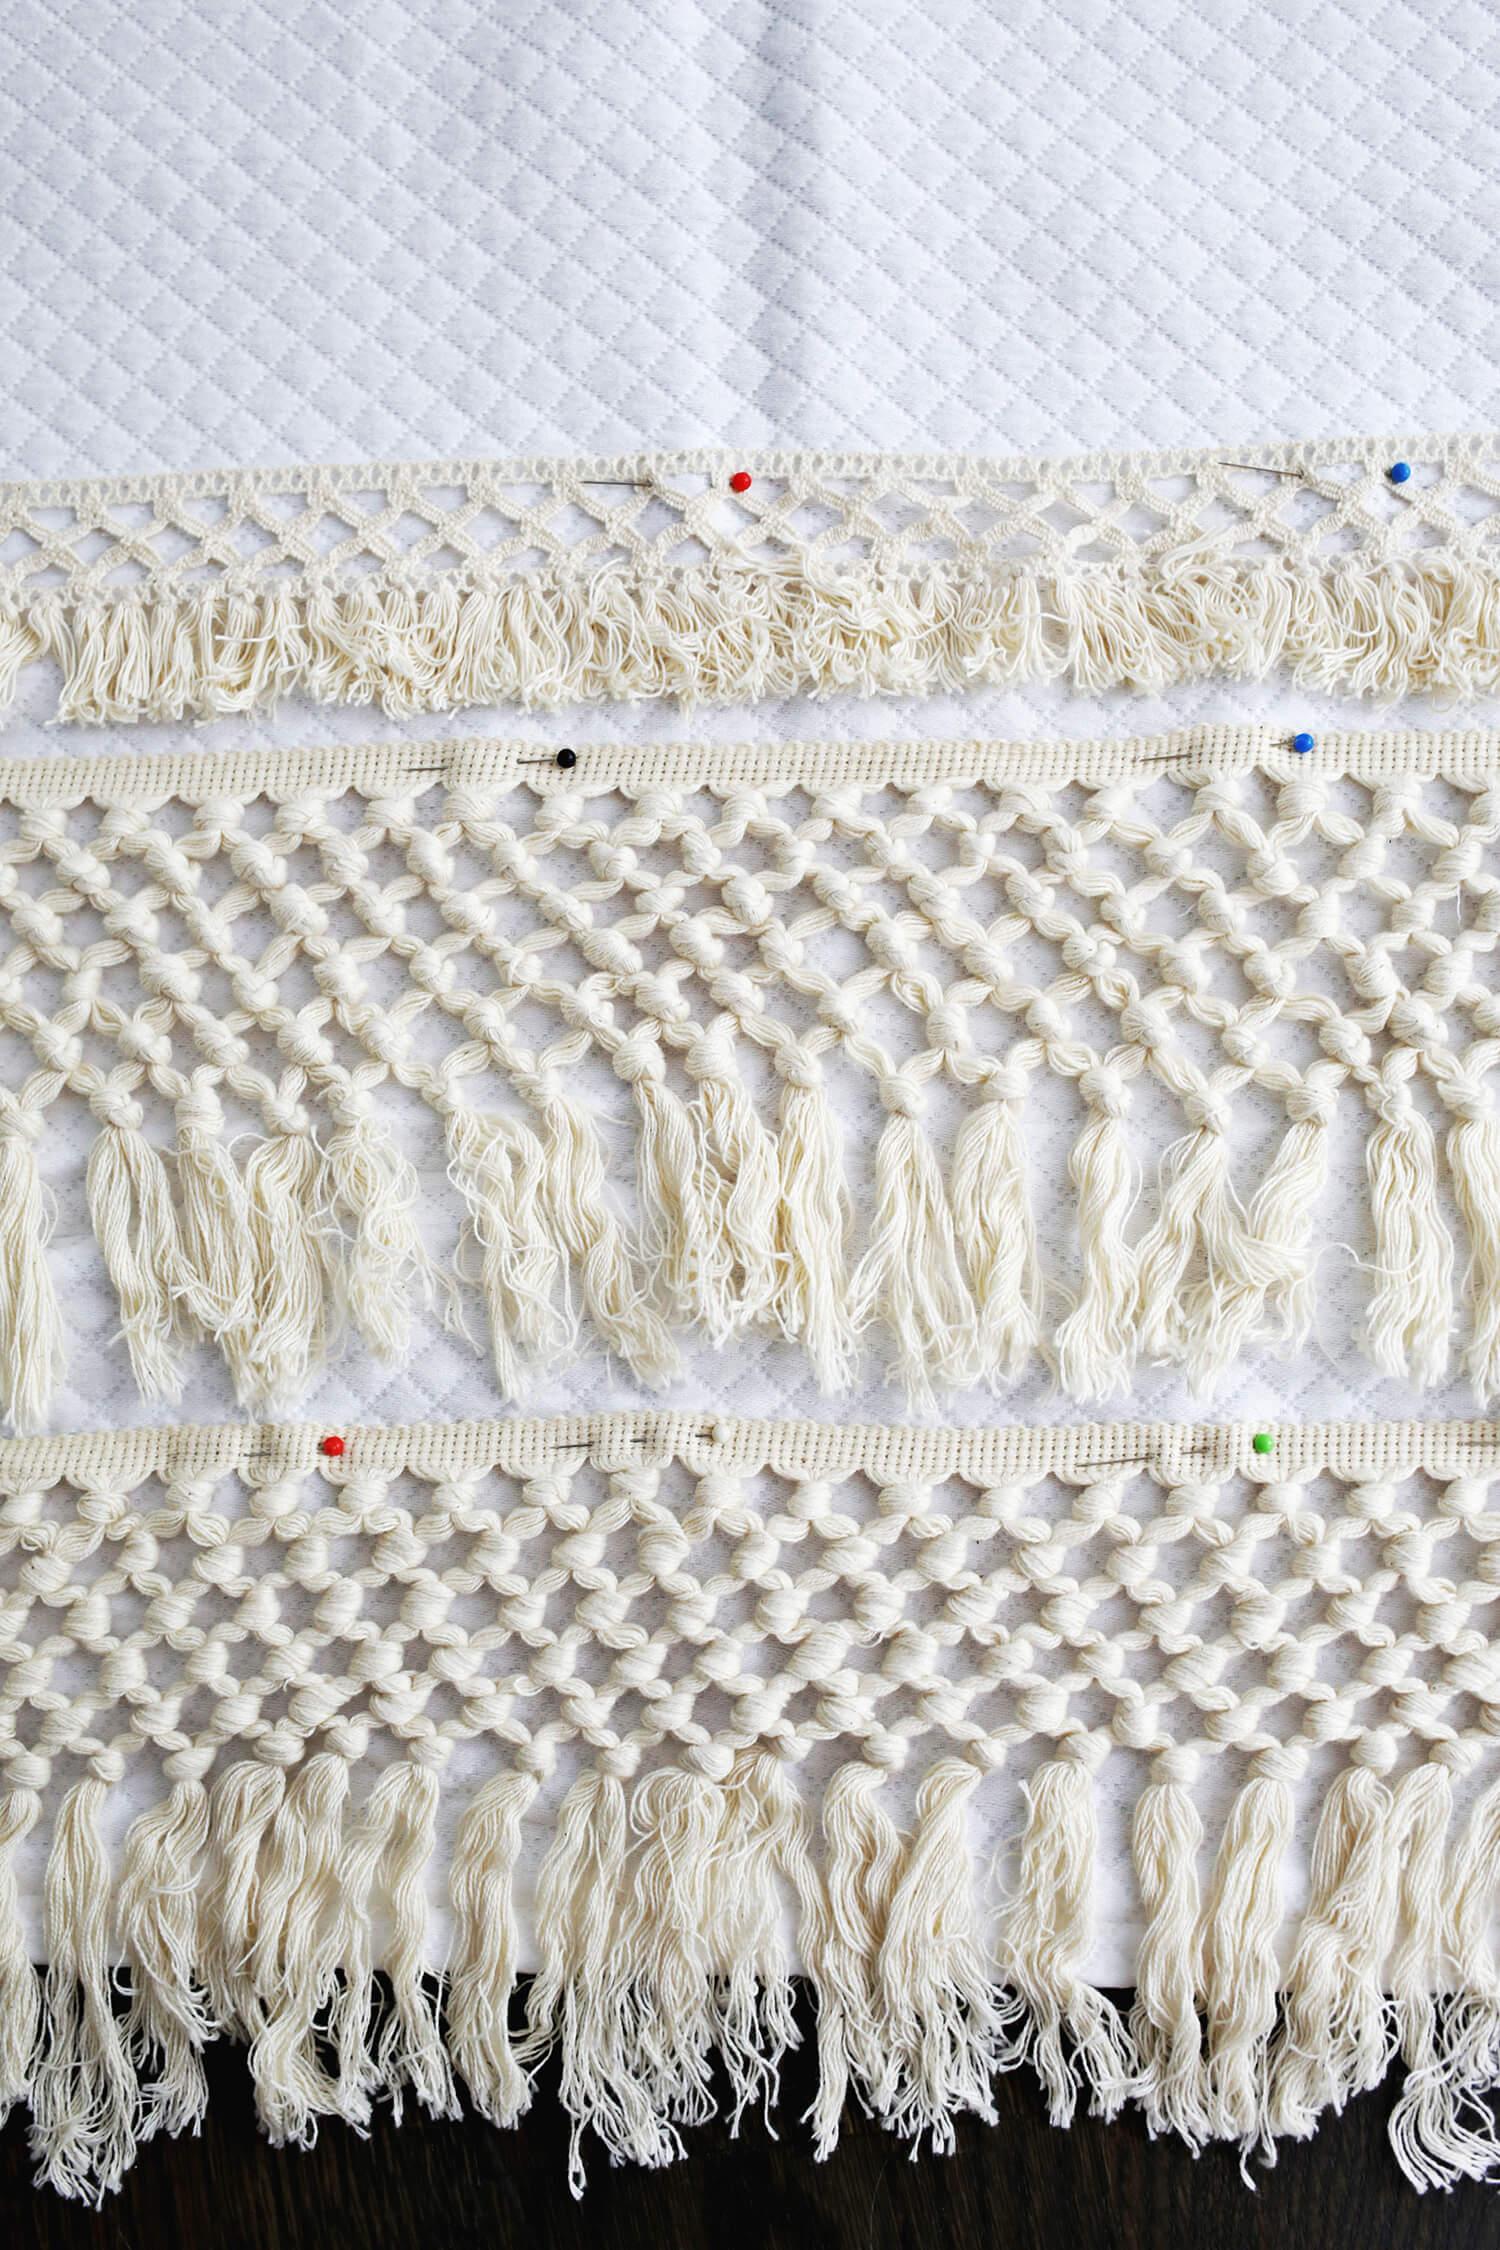 Macrame Shower Curtain DIY (click through for tutorial)